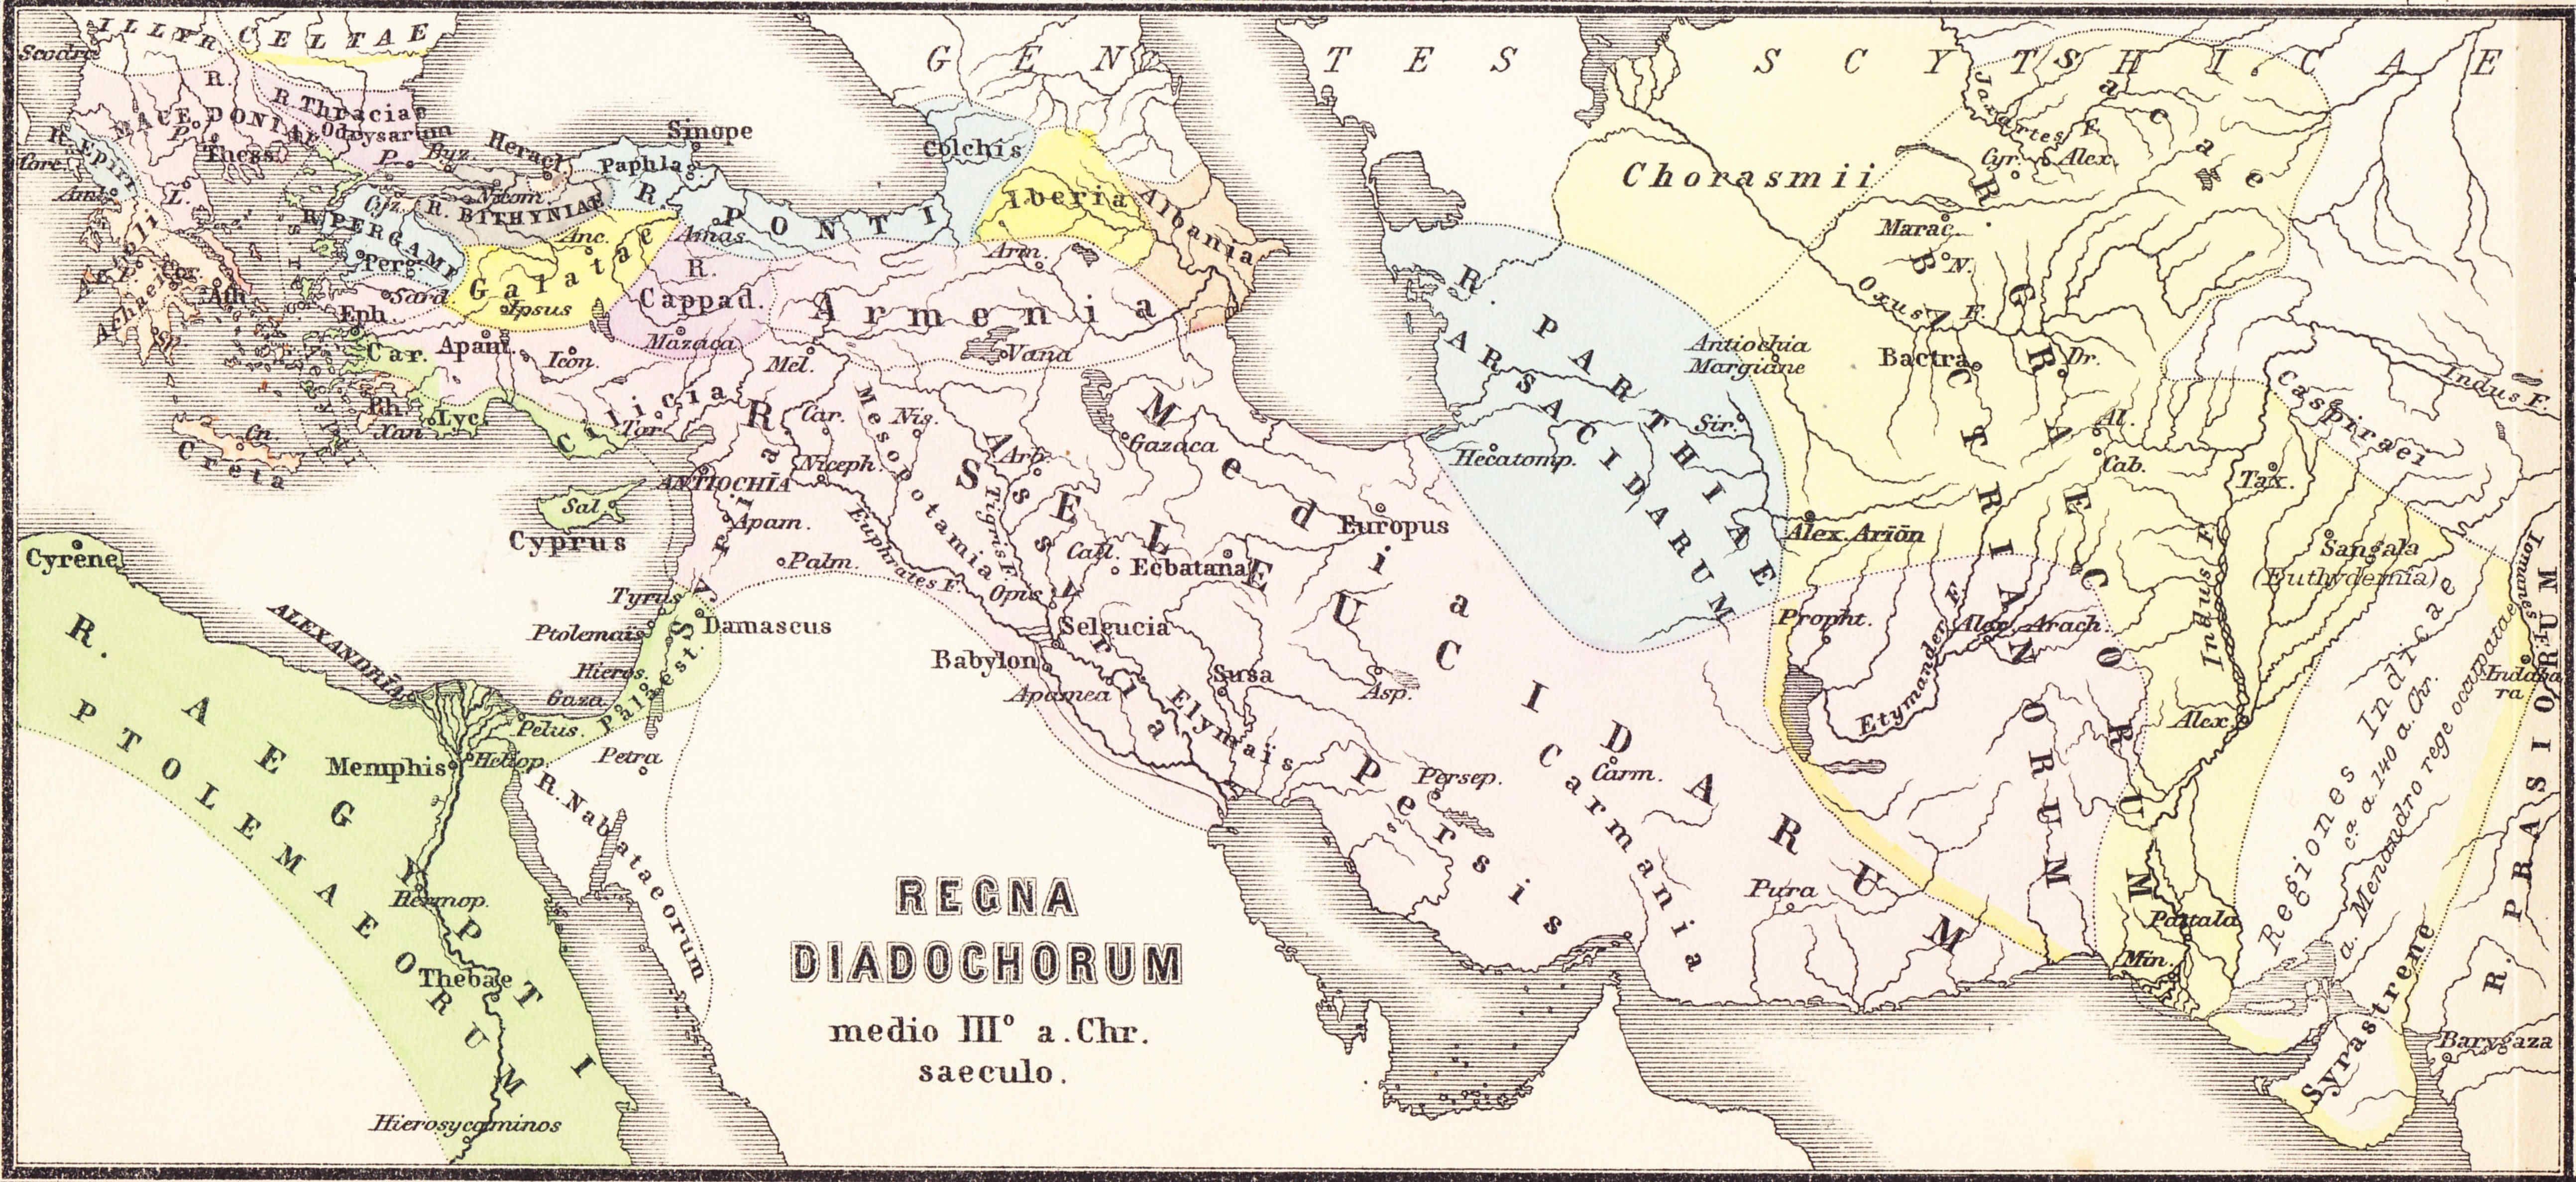 Egipto antiguo 14 y Ptolomeo I Sóter